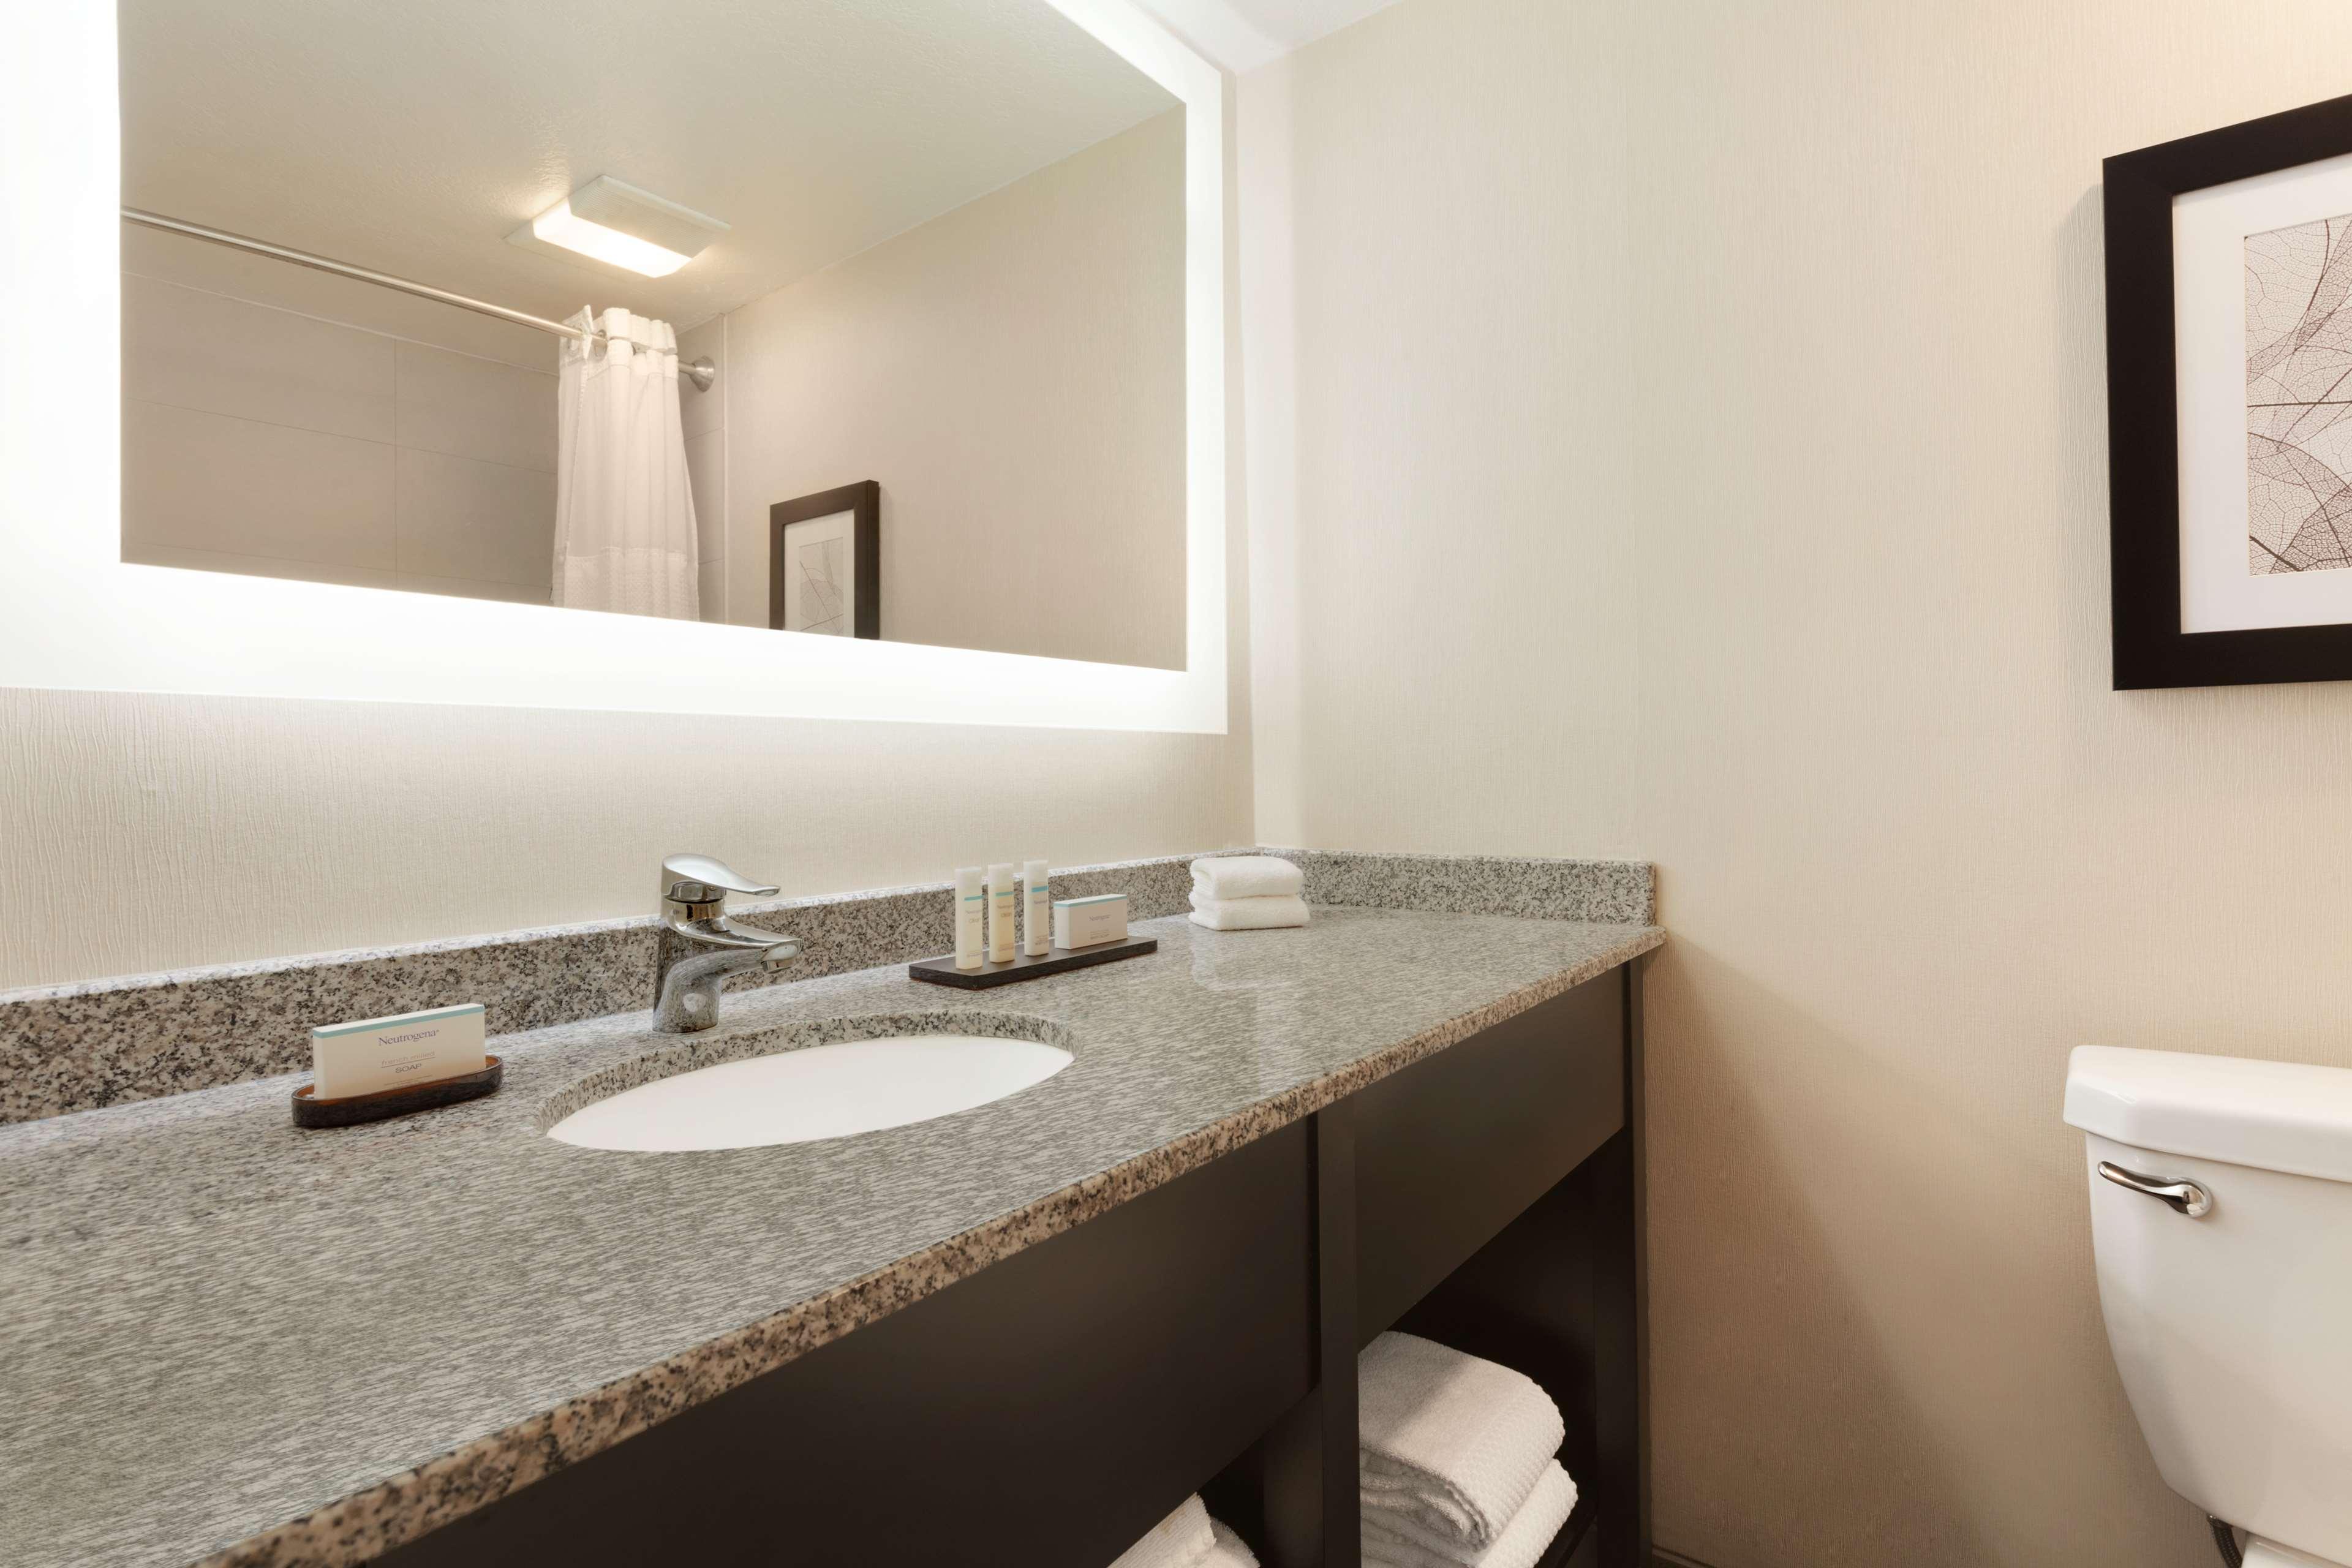 Embassy Suites by Hilton Arcadia Pasadena Area image 26